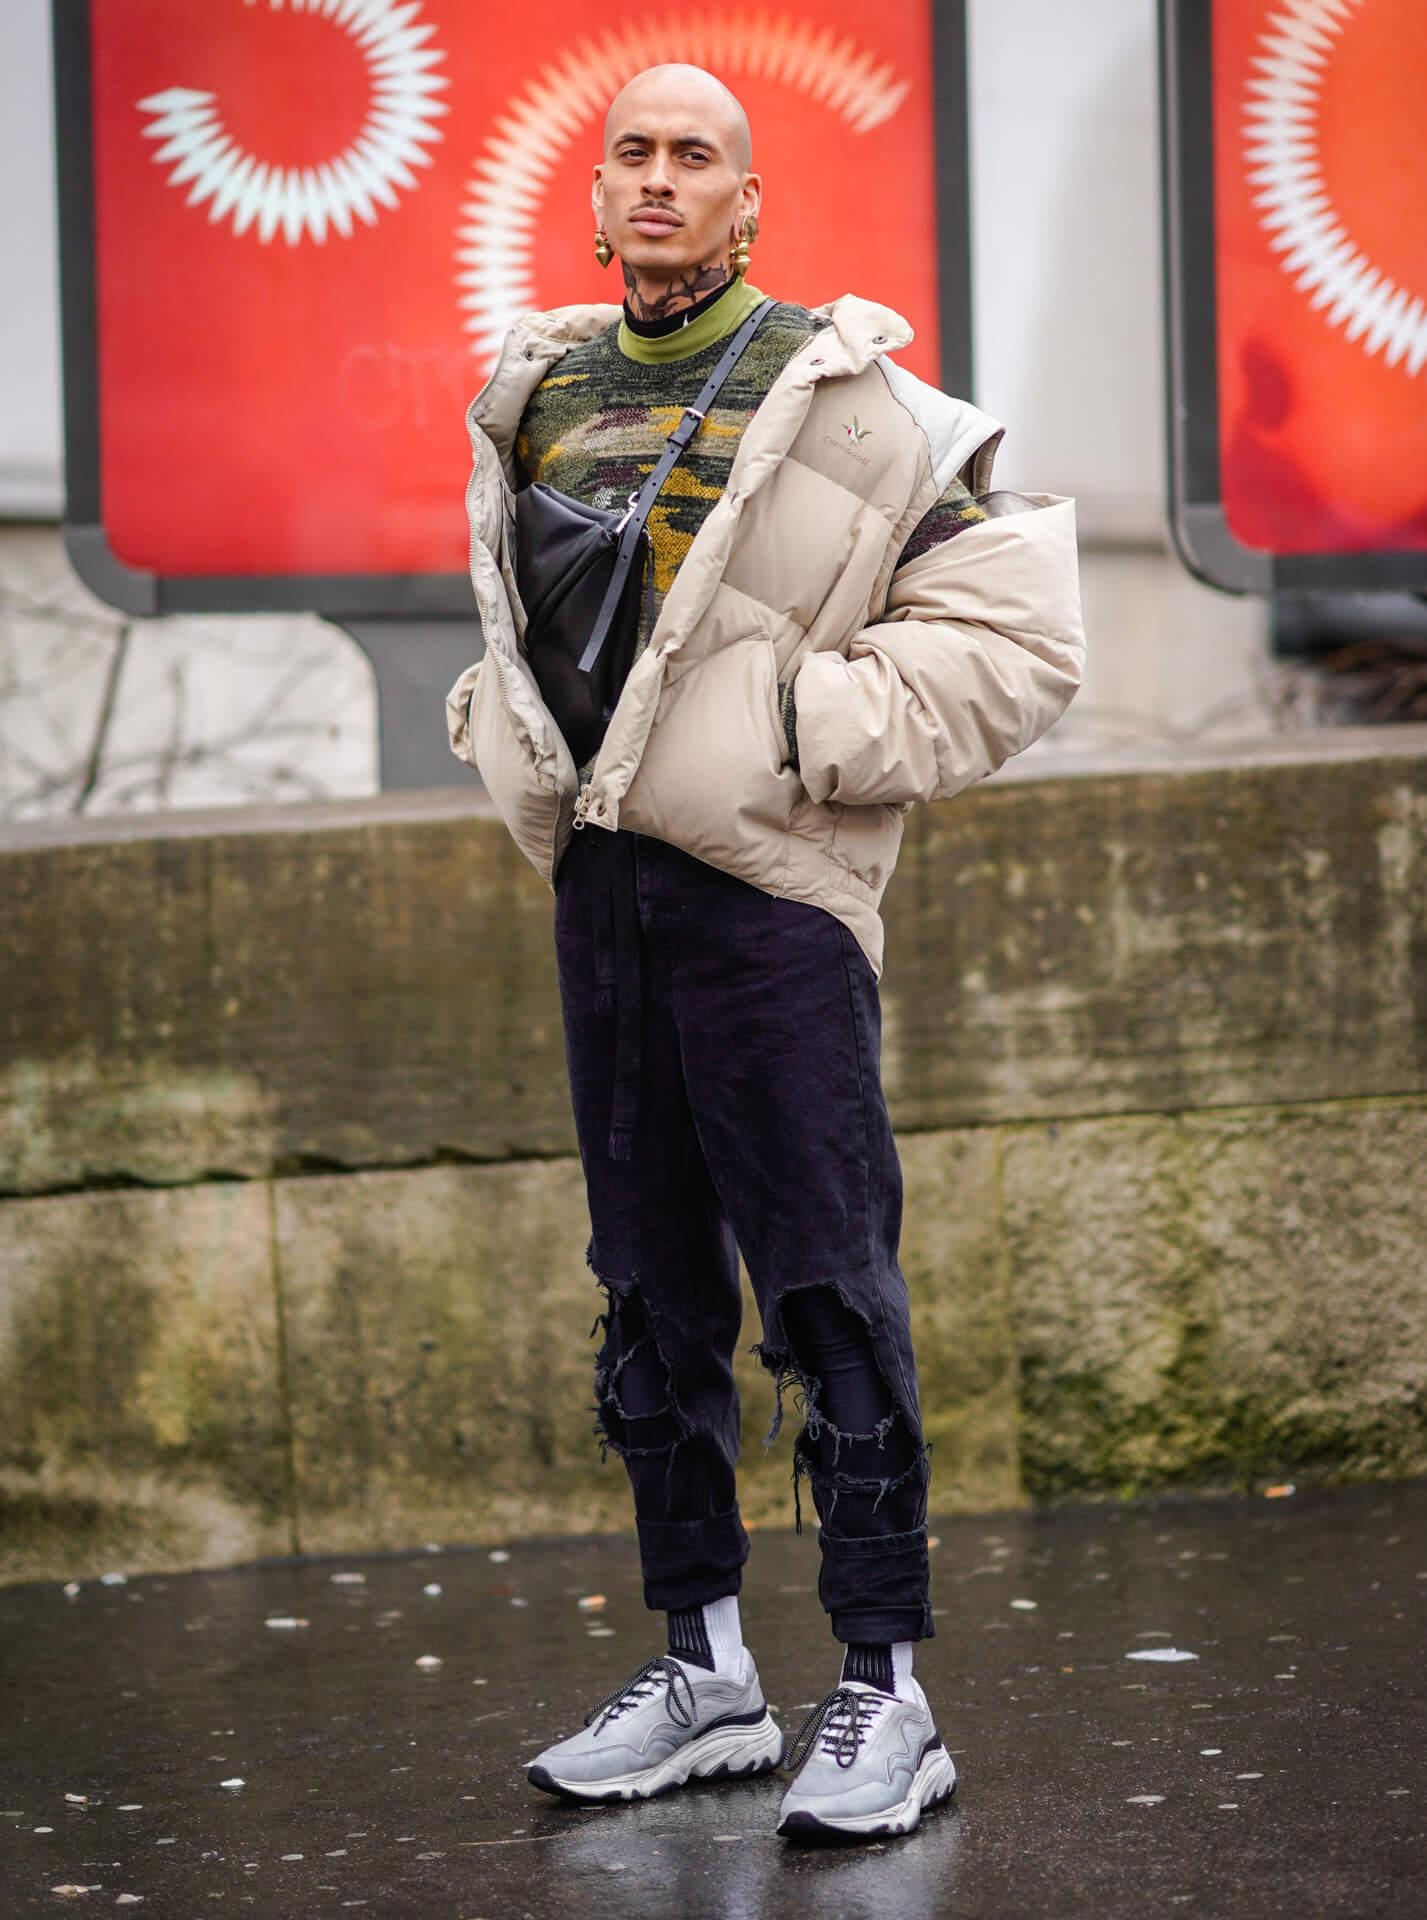 Steppjacke Männer Streetstyle Shoe Fahion